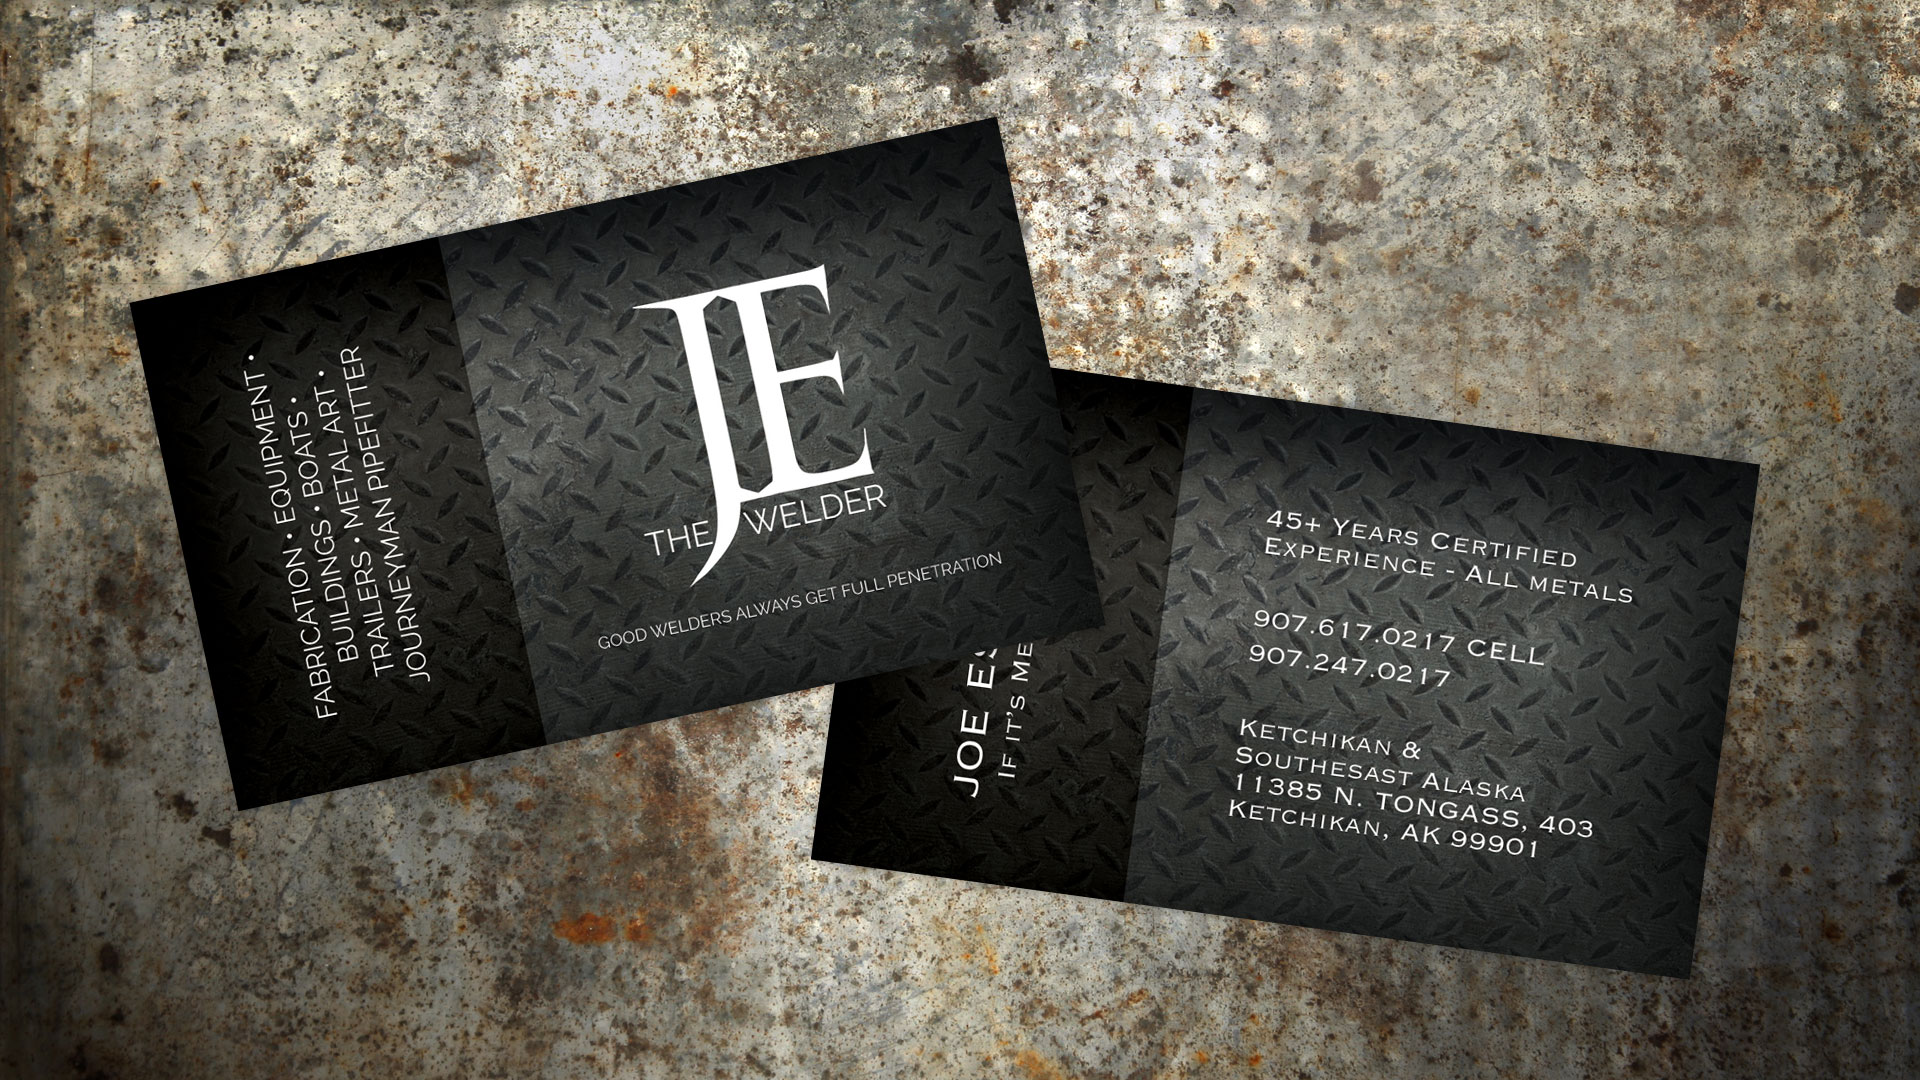 Joe The Welder Business Cards Misti